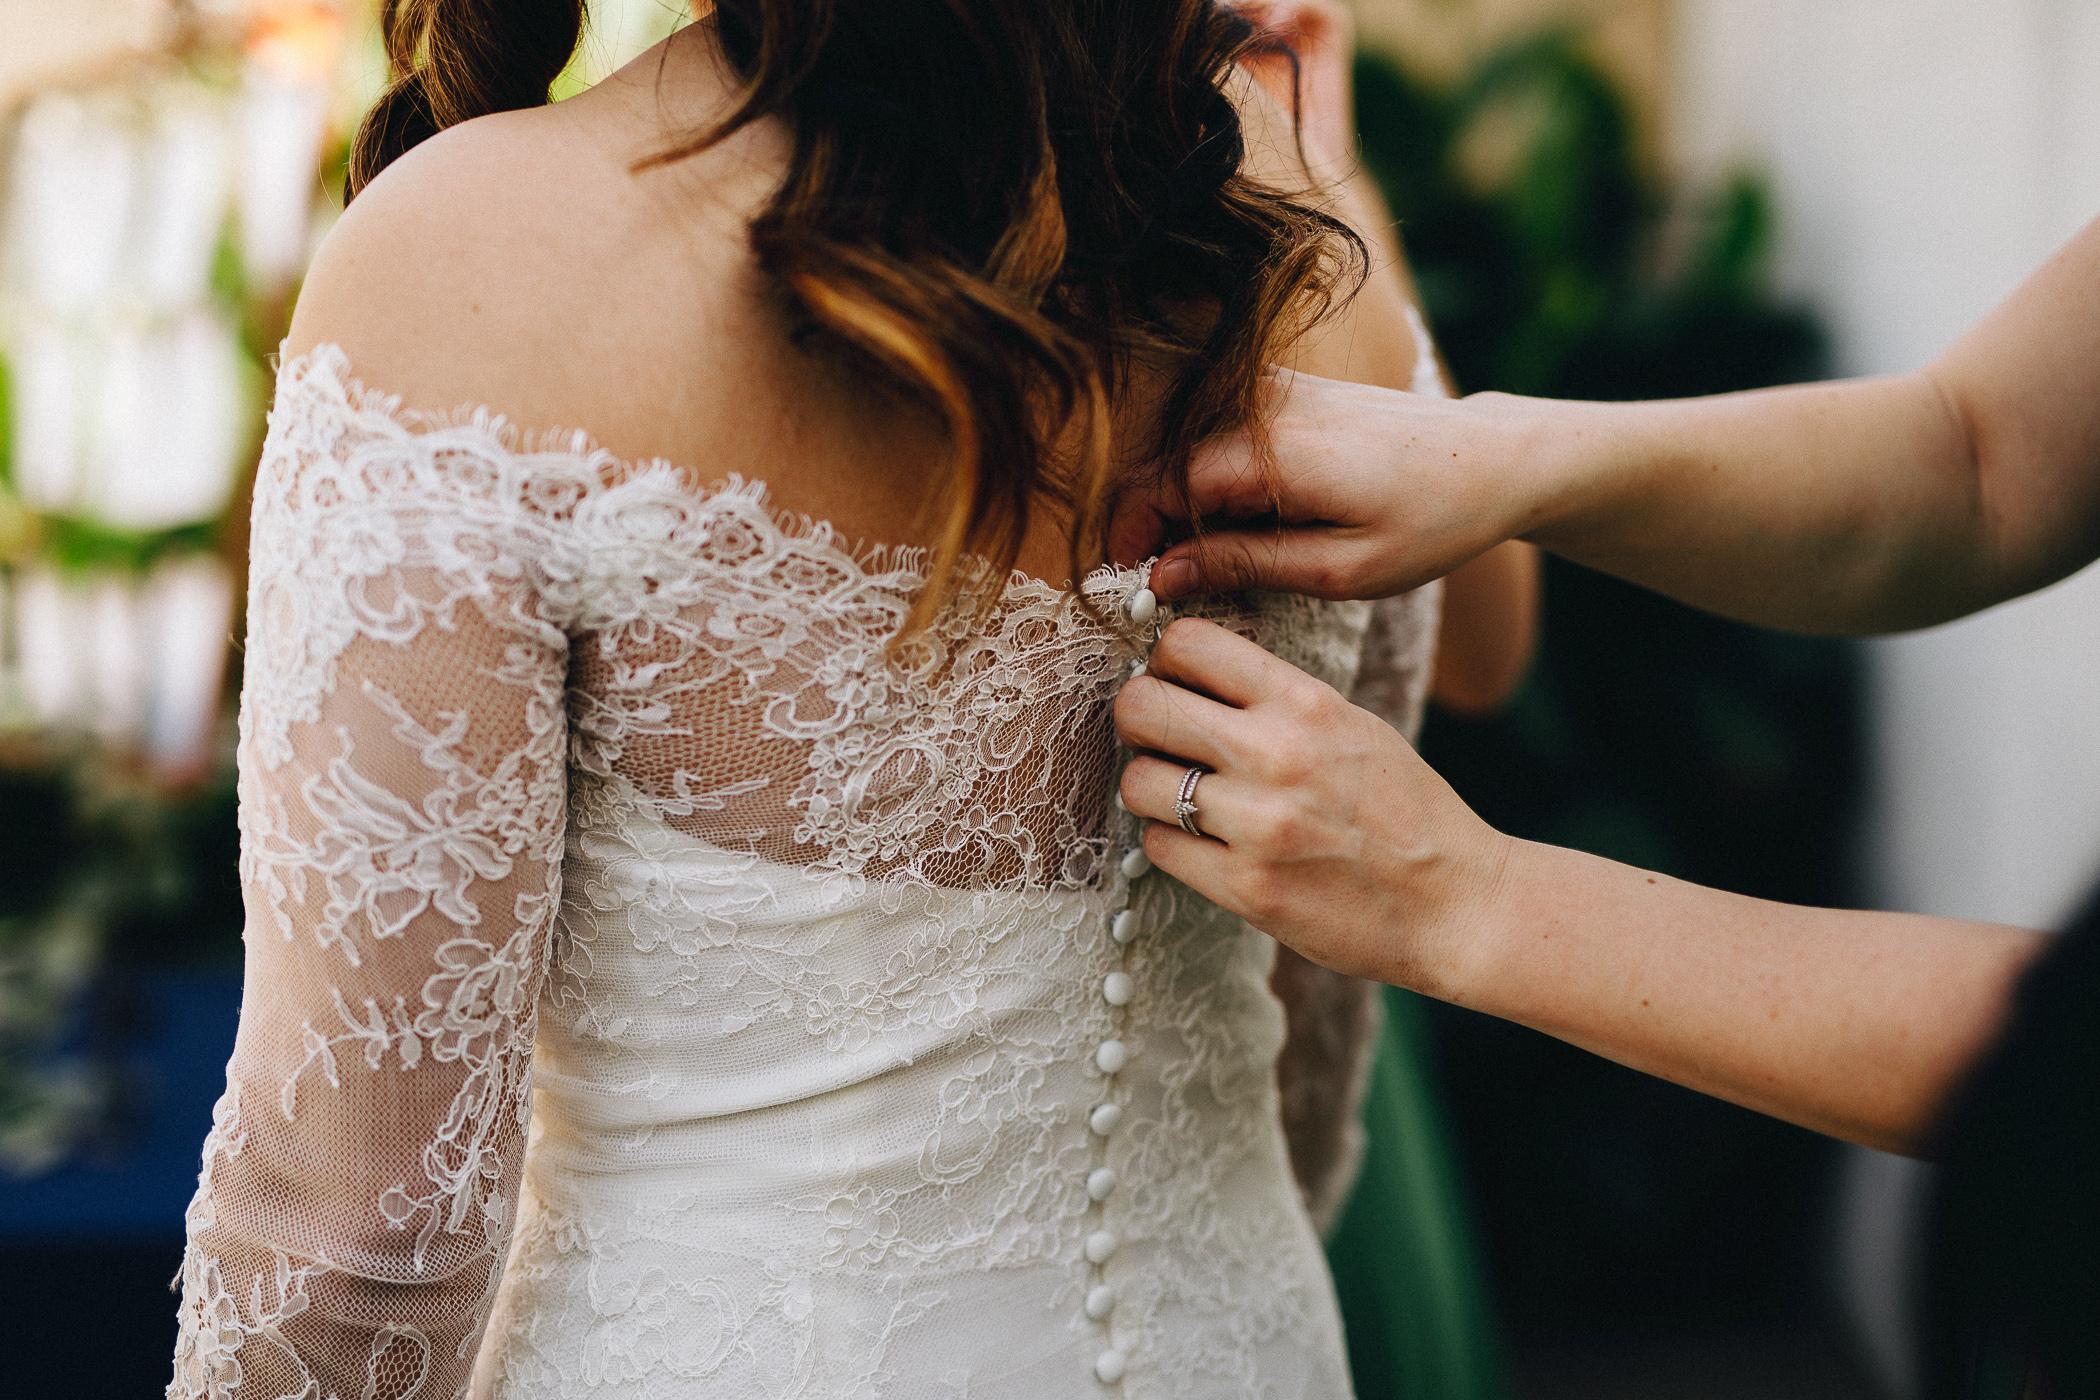 181104-Luxium-Weddings-Arizona-@matt__Le-Brandon-Kariana-Phoenix-Valley-Garden-Center-1012.jpg